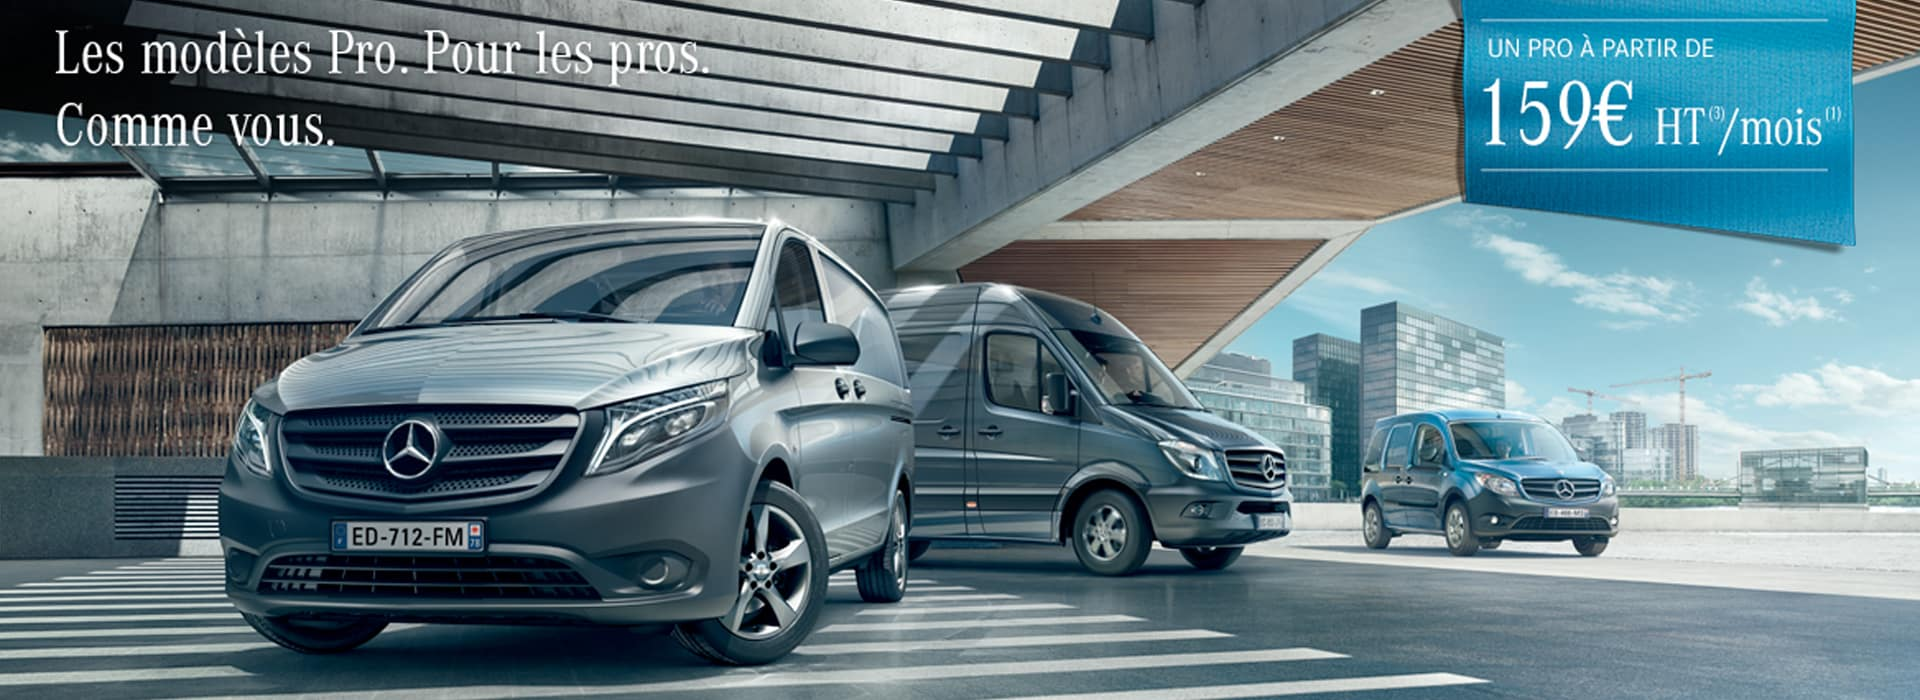 Mercedes benz utilitaires niort concessionnaire garage for Garage mercedes garges les gonesse